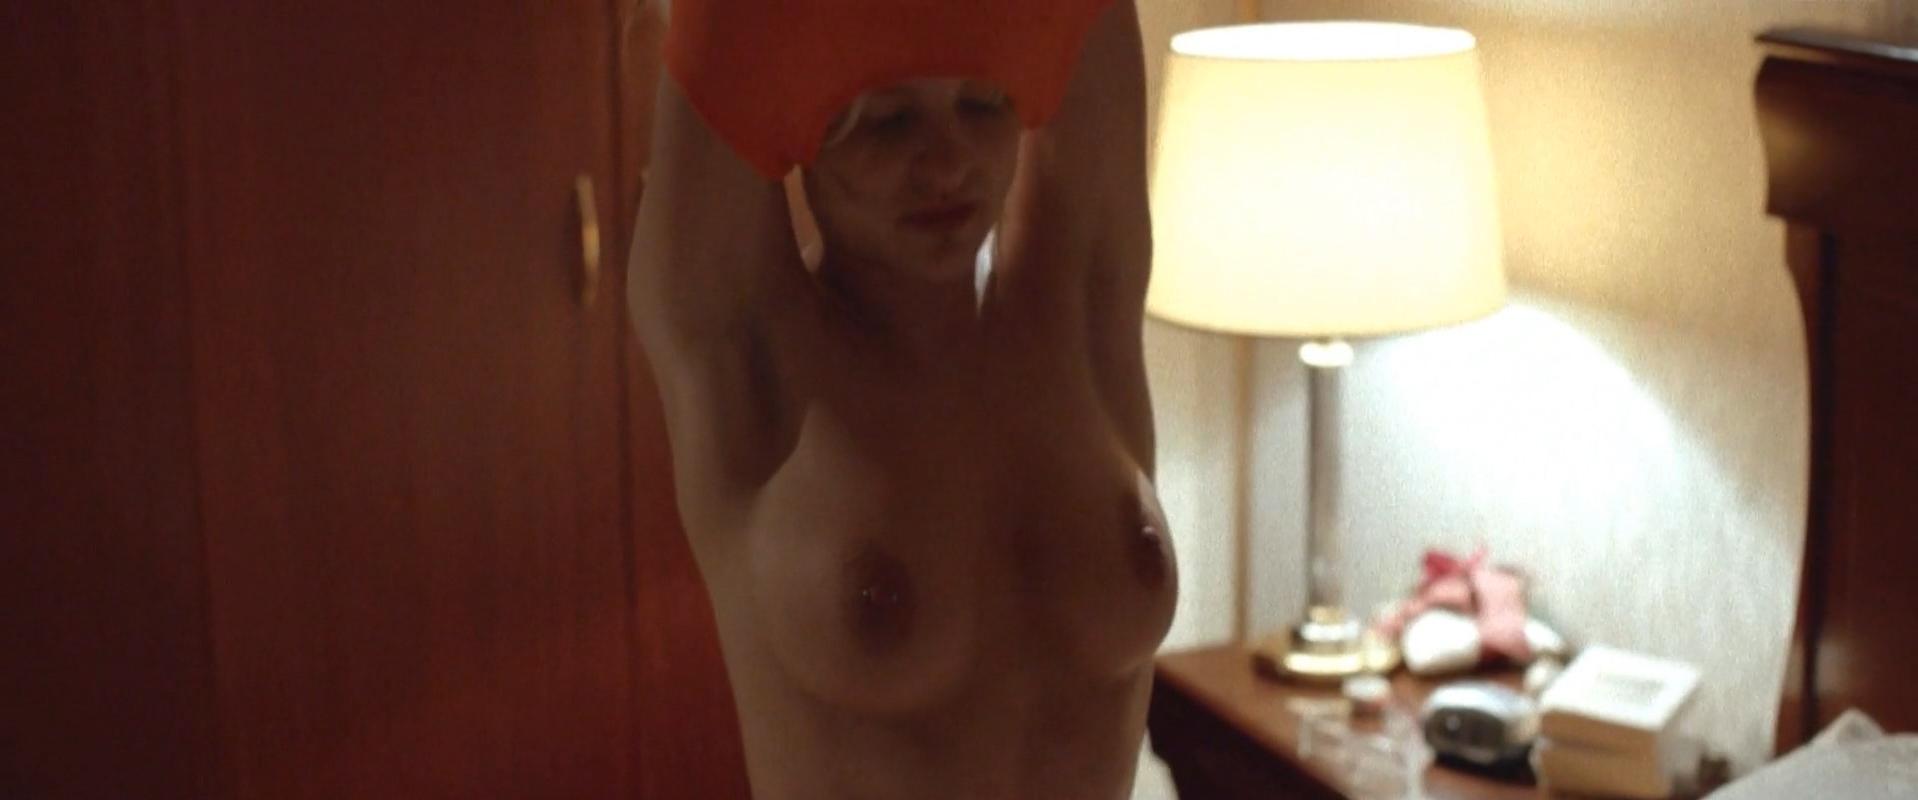 Maria Birta nude - Blacks Game (2012)